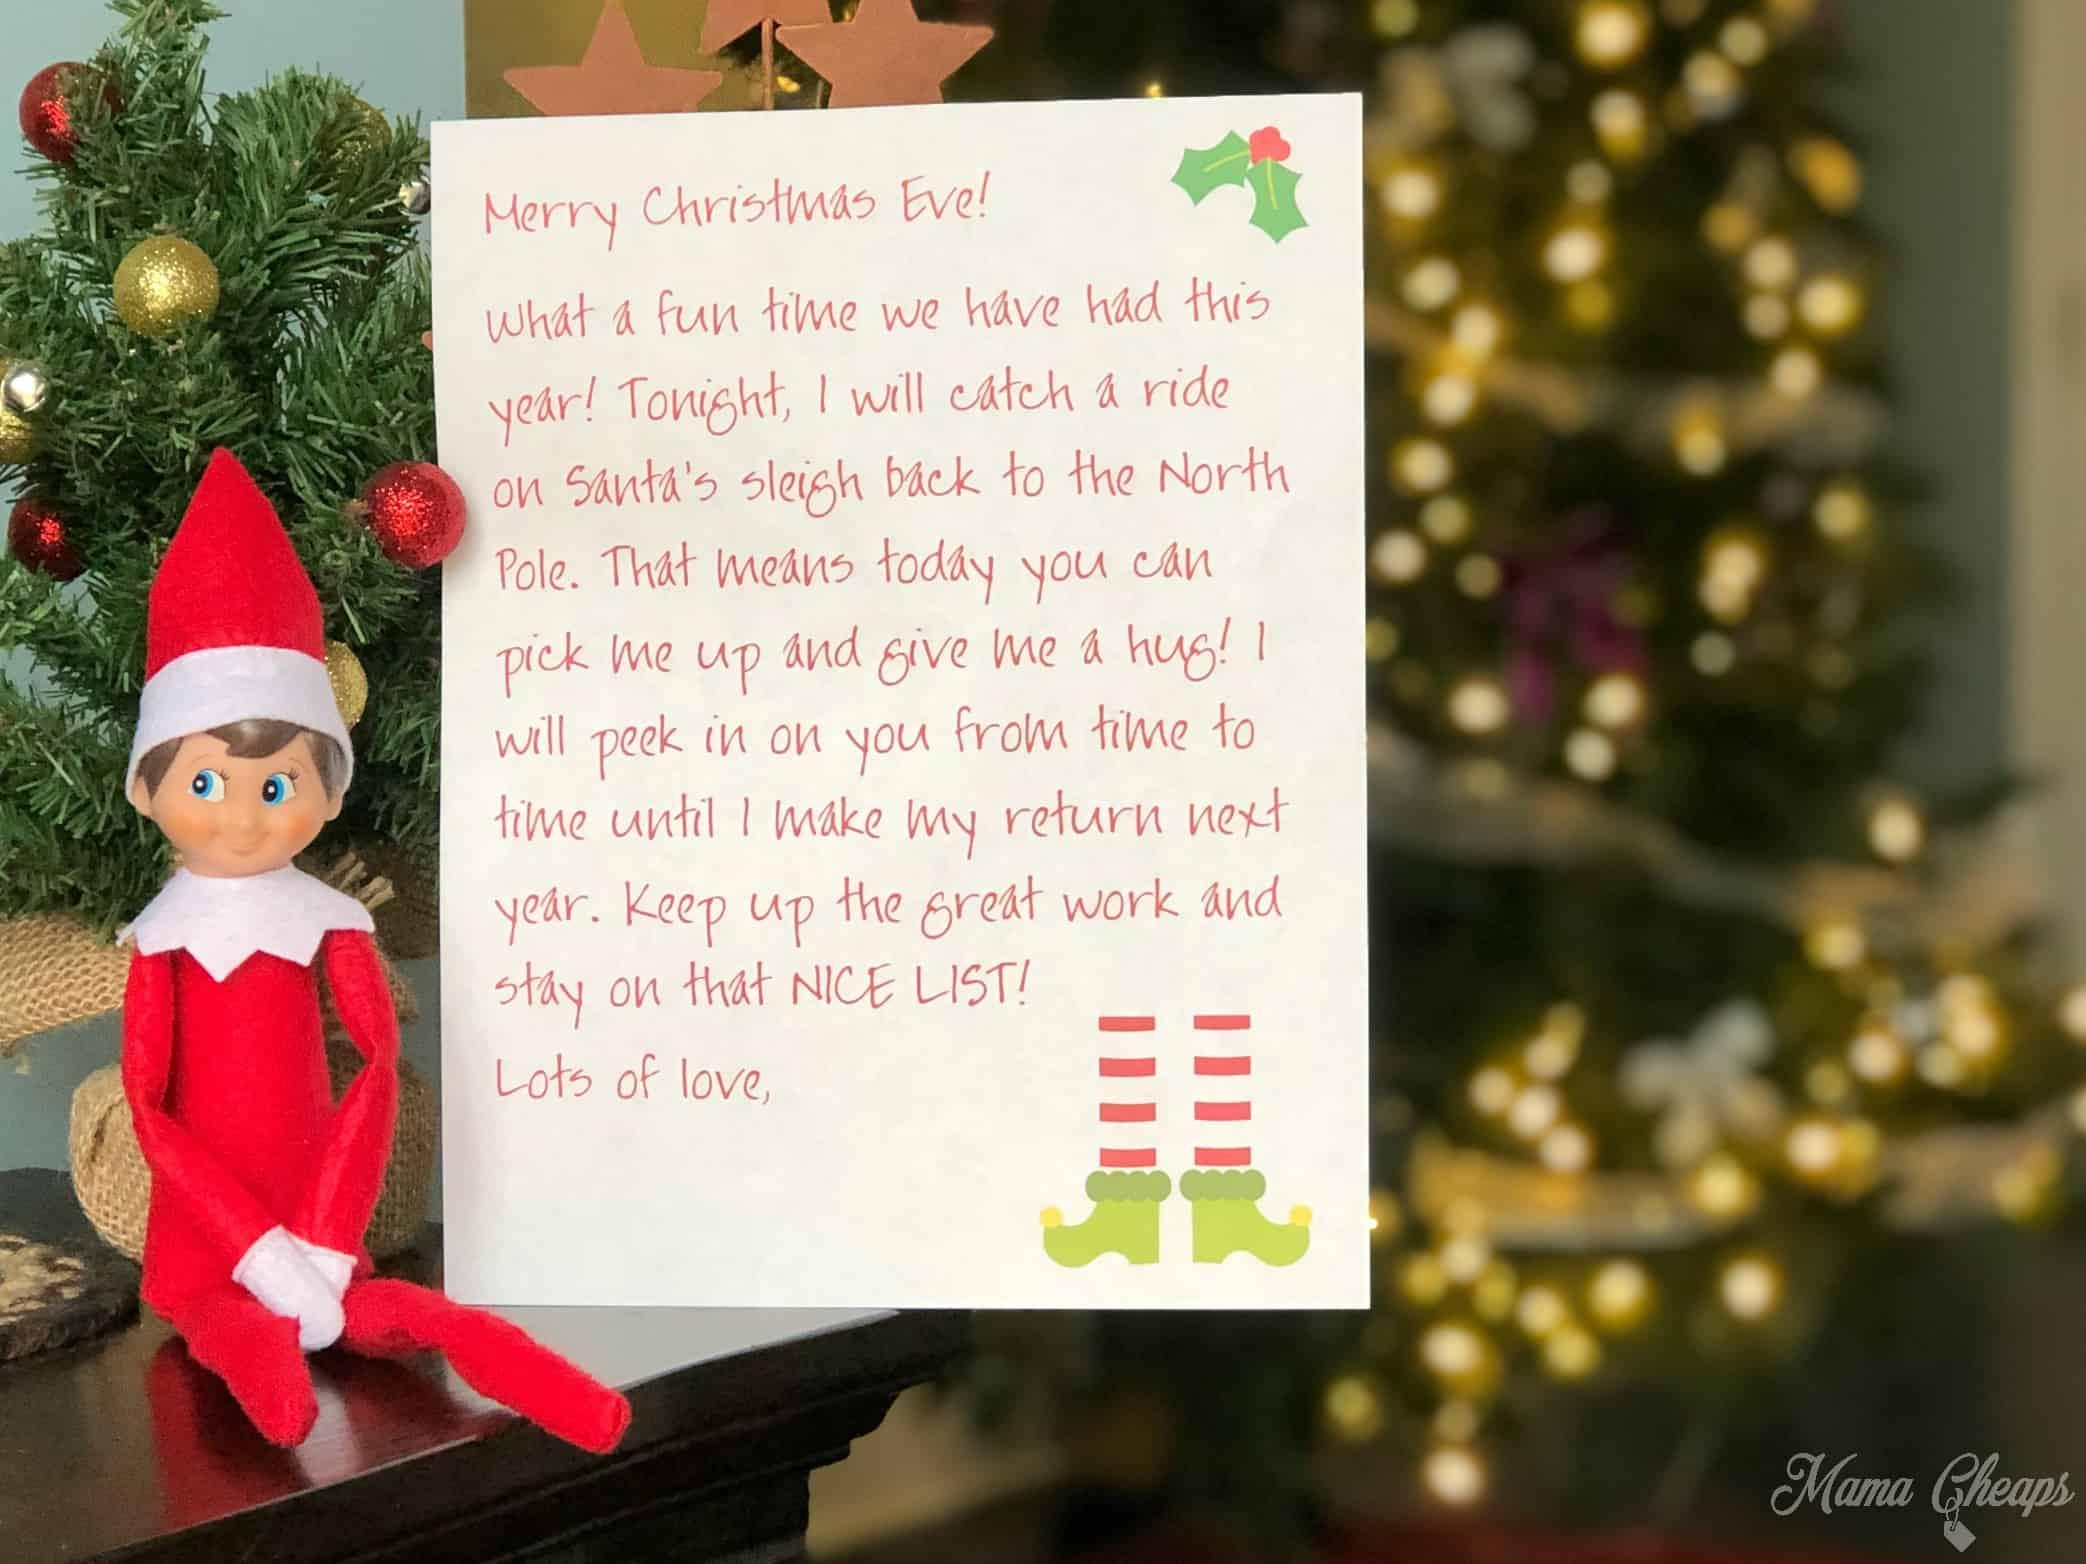 photograph regarding Elf on the Shelf Return Letter Printable identify Printable Elf Farewell Letter for Xmas Eve Mama Cheaps